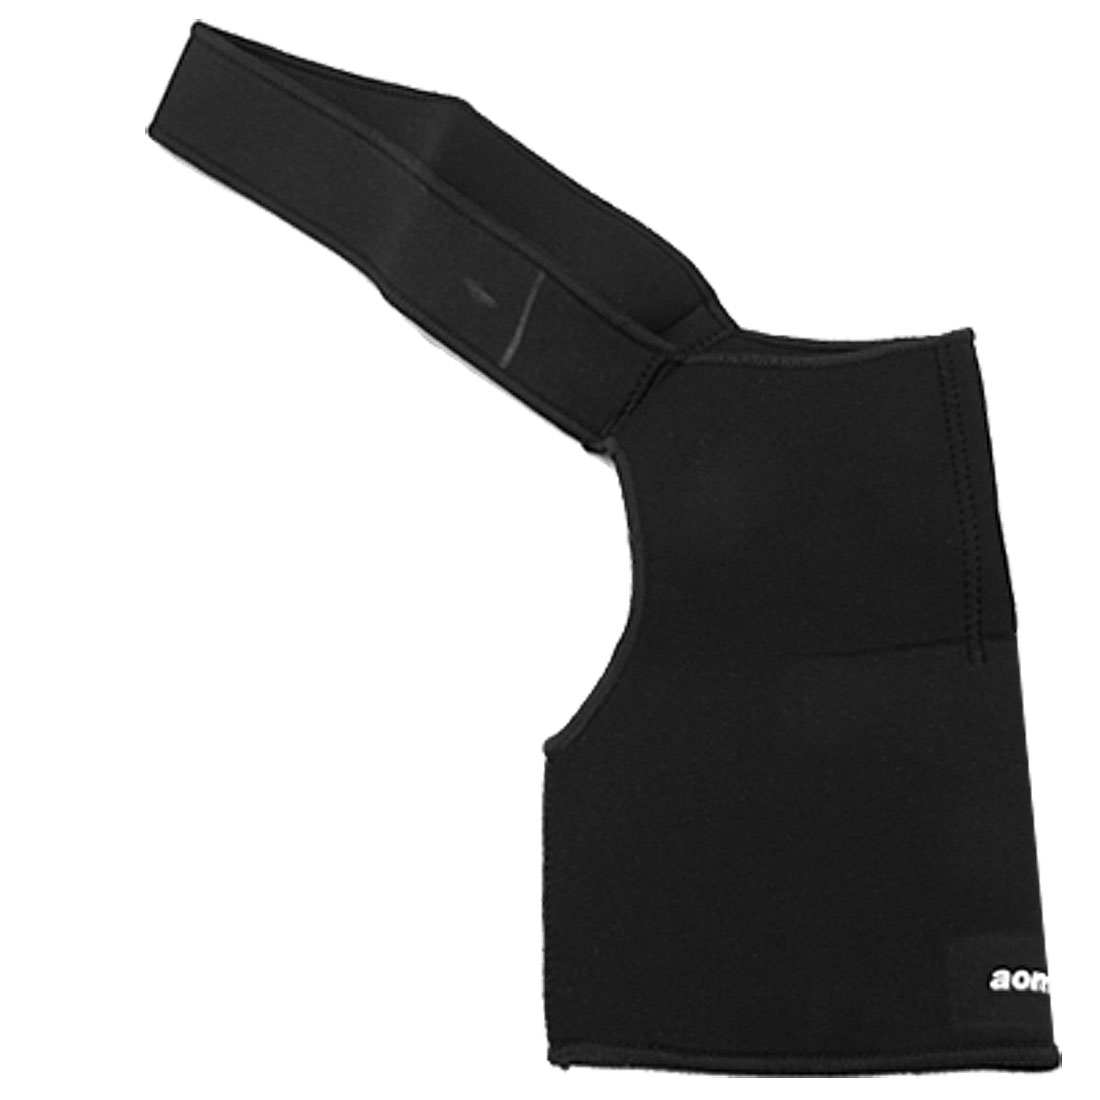 Neoprene Single Shoulder Support Wrap Brace Black